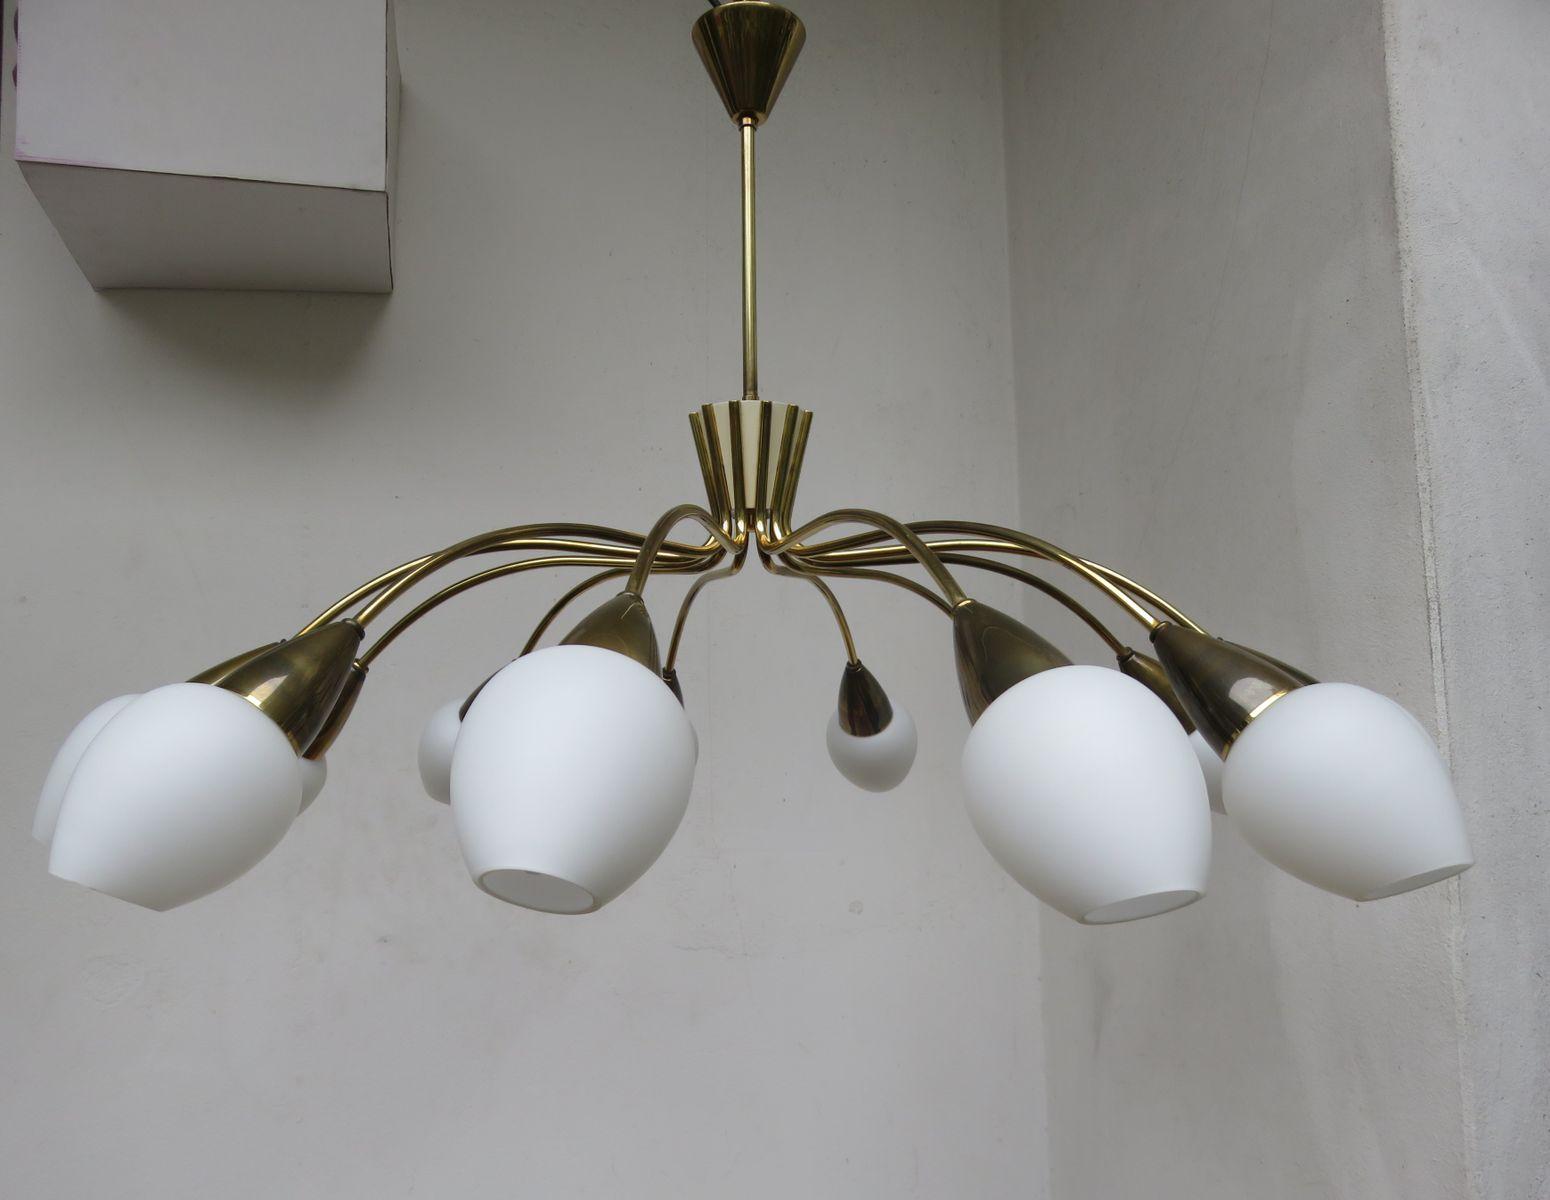 Italienische 12-Armige Messing Deckenlampe, 1950er